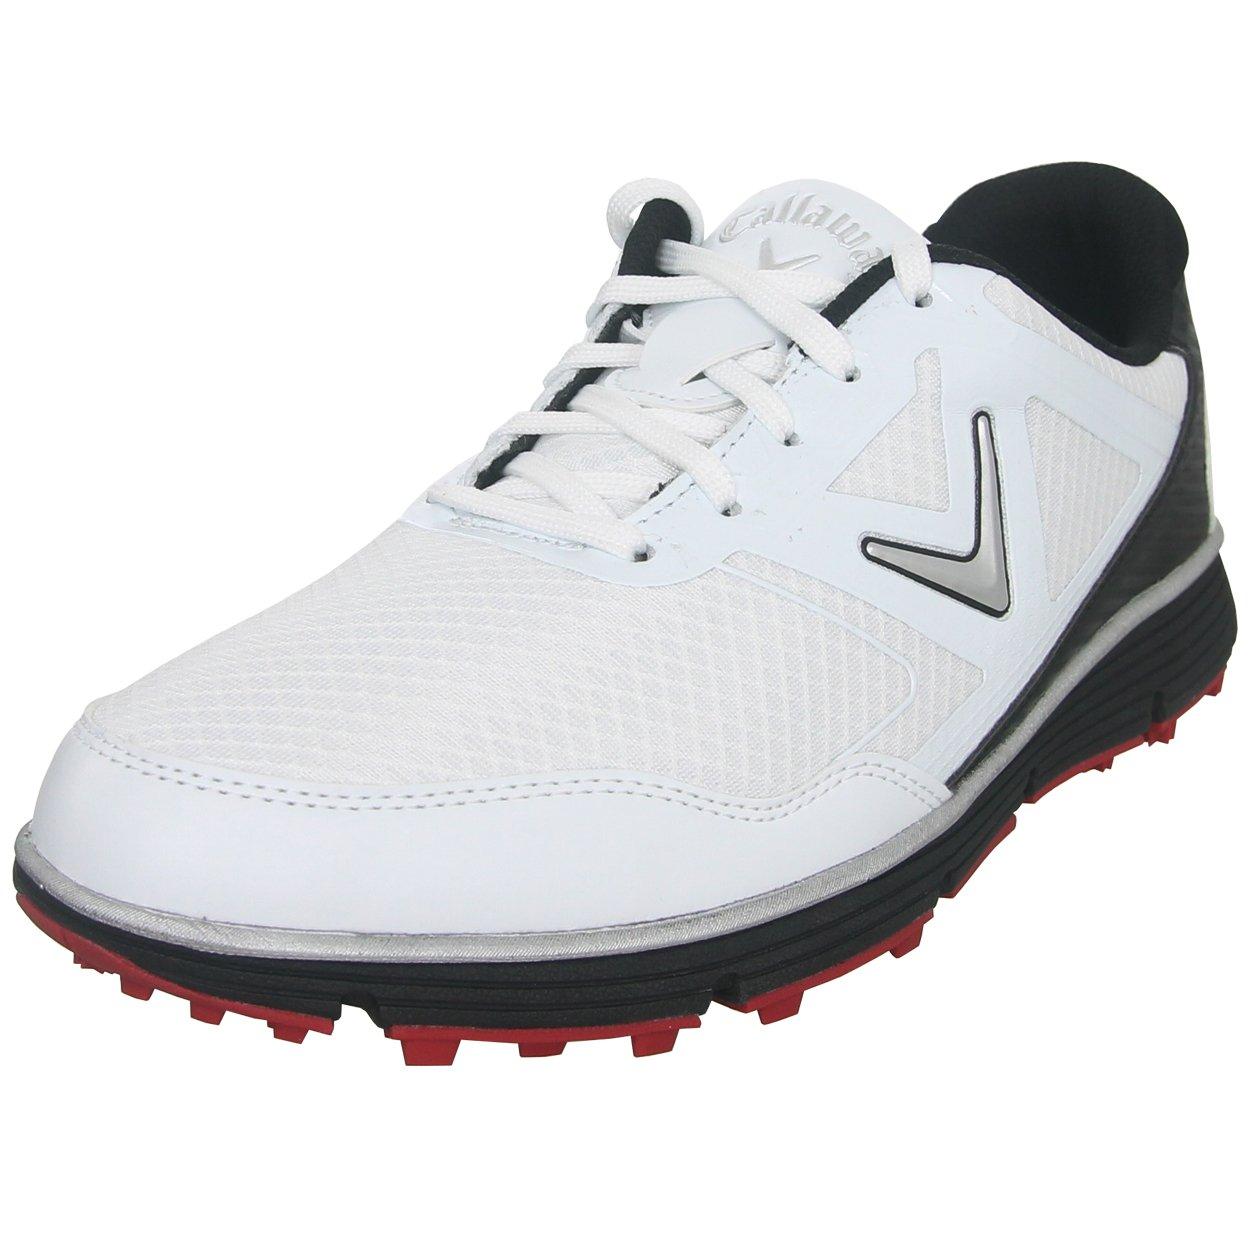 Callaway Men's Balboa Vent Golf Shoe, White/Black, 10 2E US by Callaway